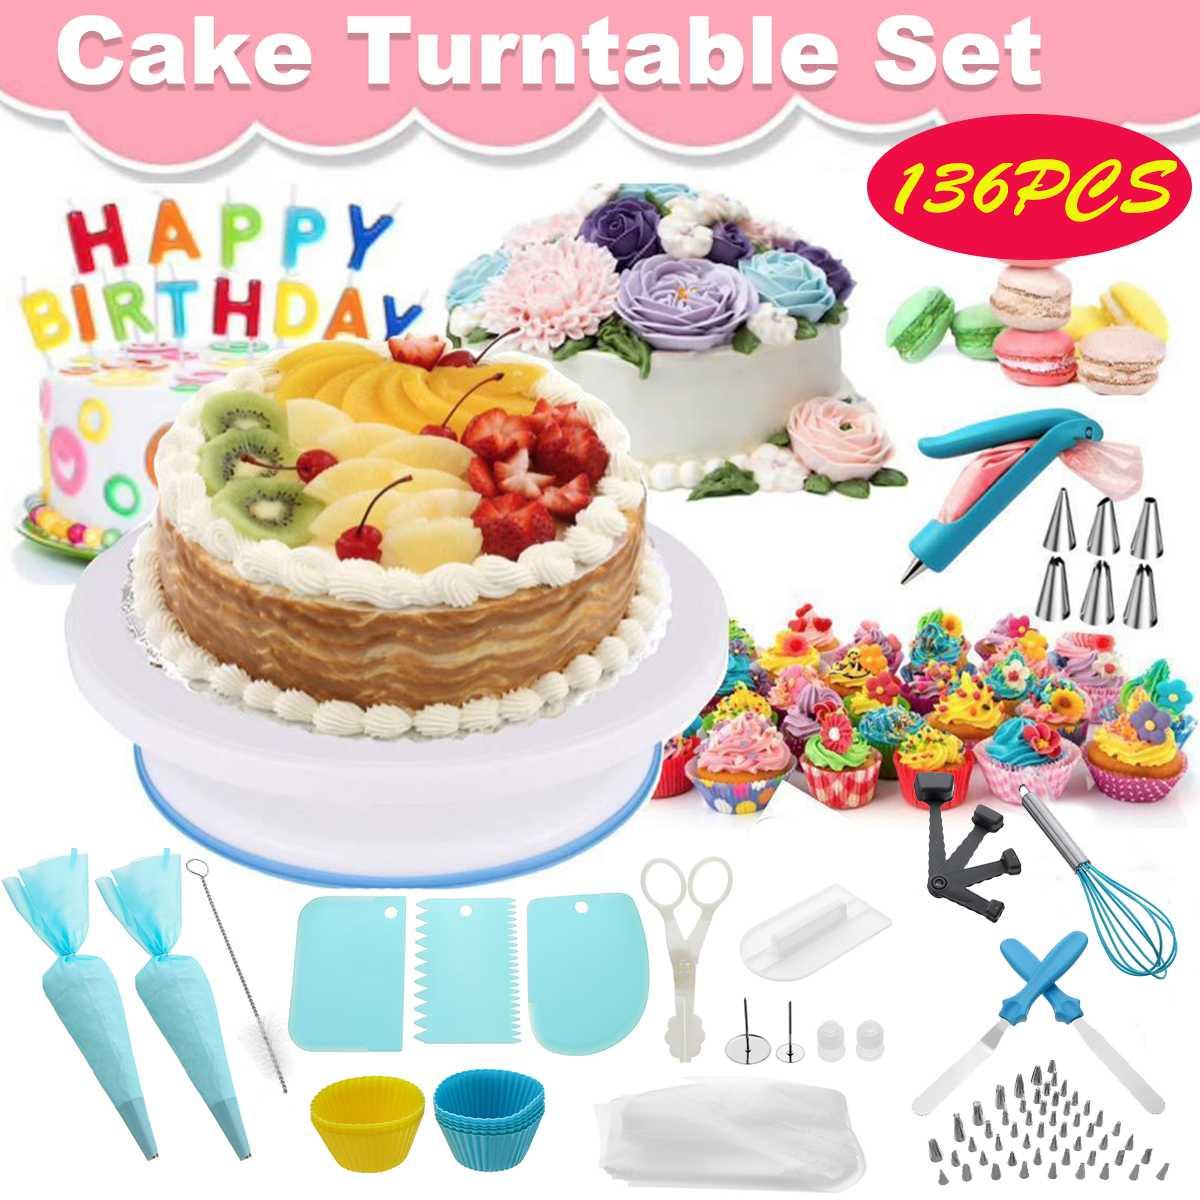 136Pcs/Set Cake Decorating Kit Pastry Tube Fondant Tool Cake Turntable Set Kitchen Cake Dessert Baking Bakeware Pastry Supplies